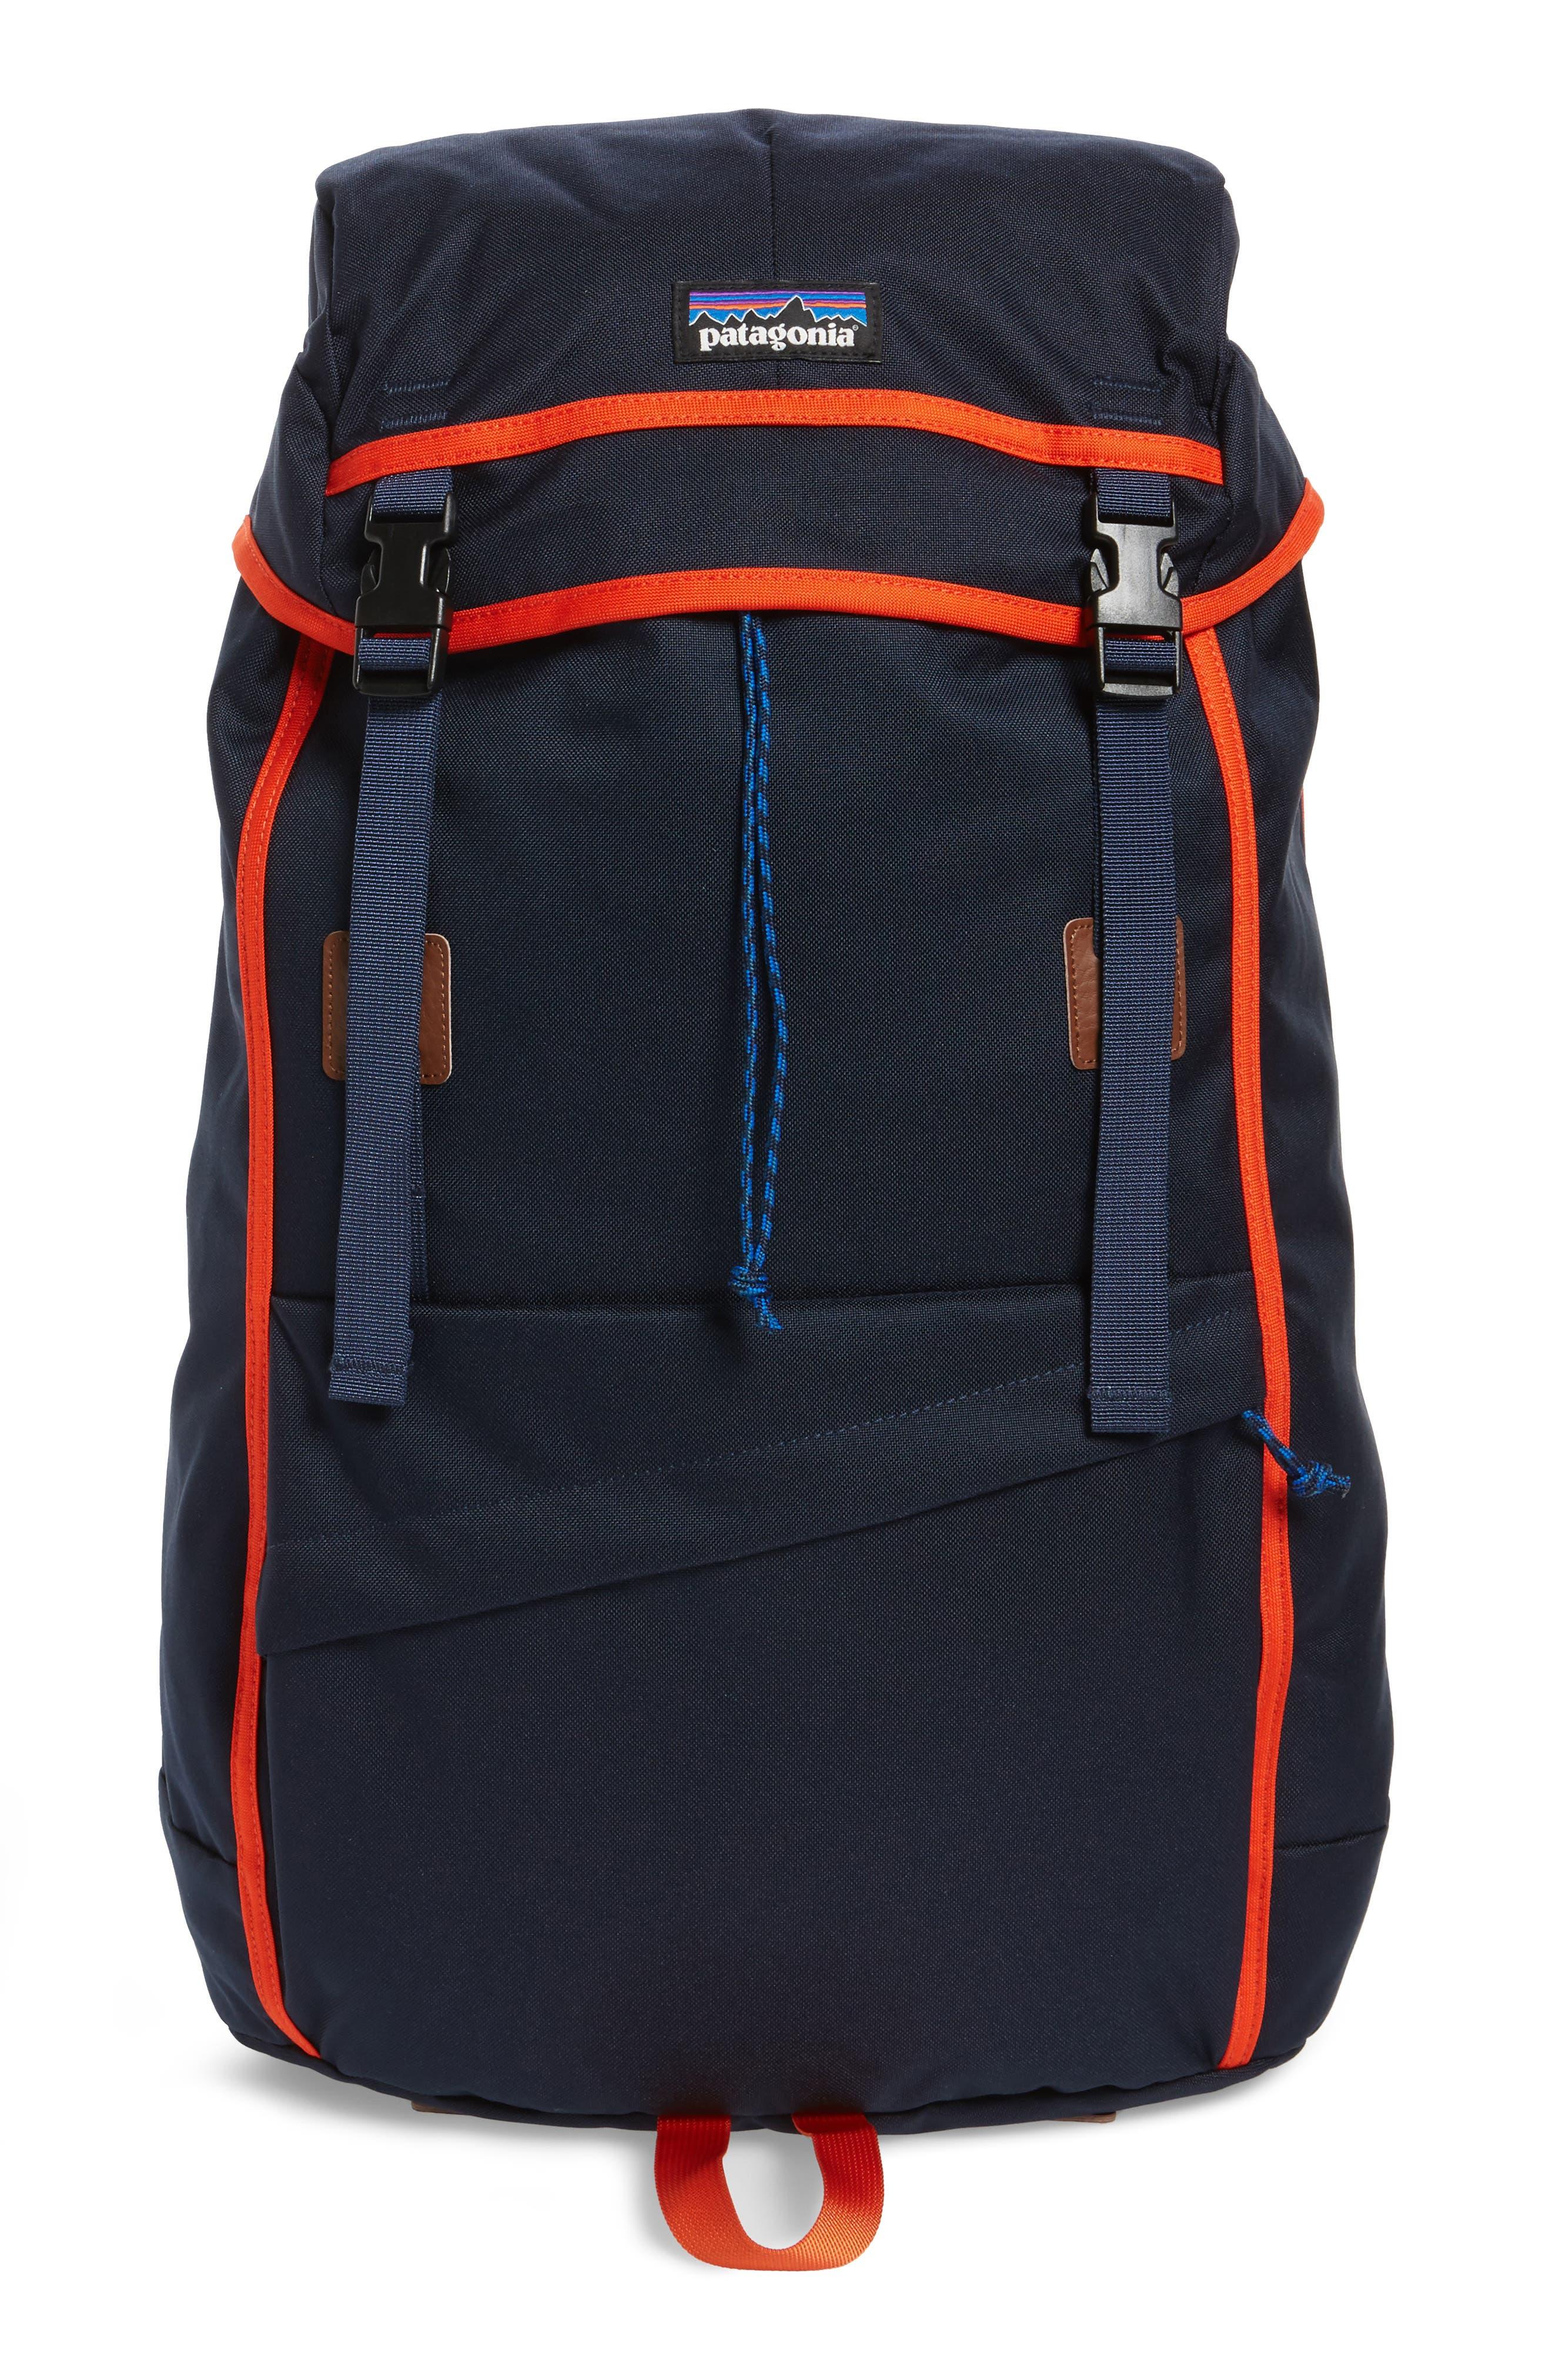 Alternate Image 1 Selected - Patagonia Arbor Grande 32-Liter Backpack